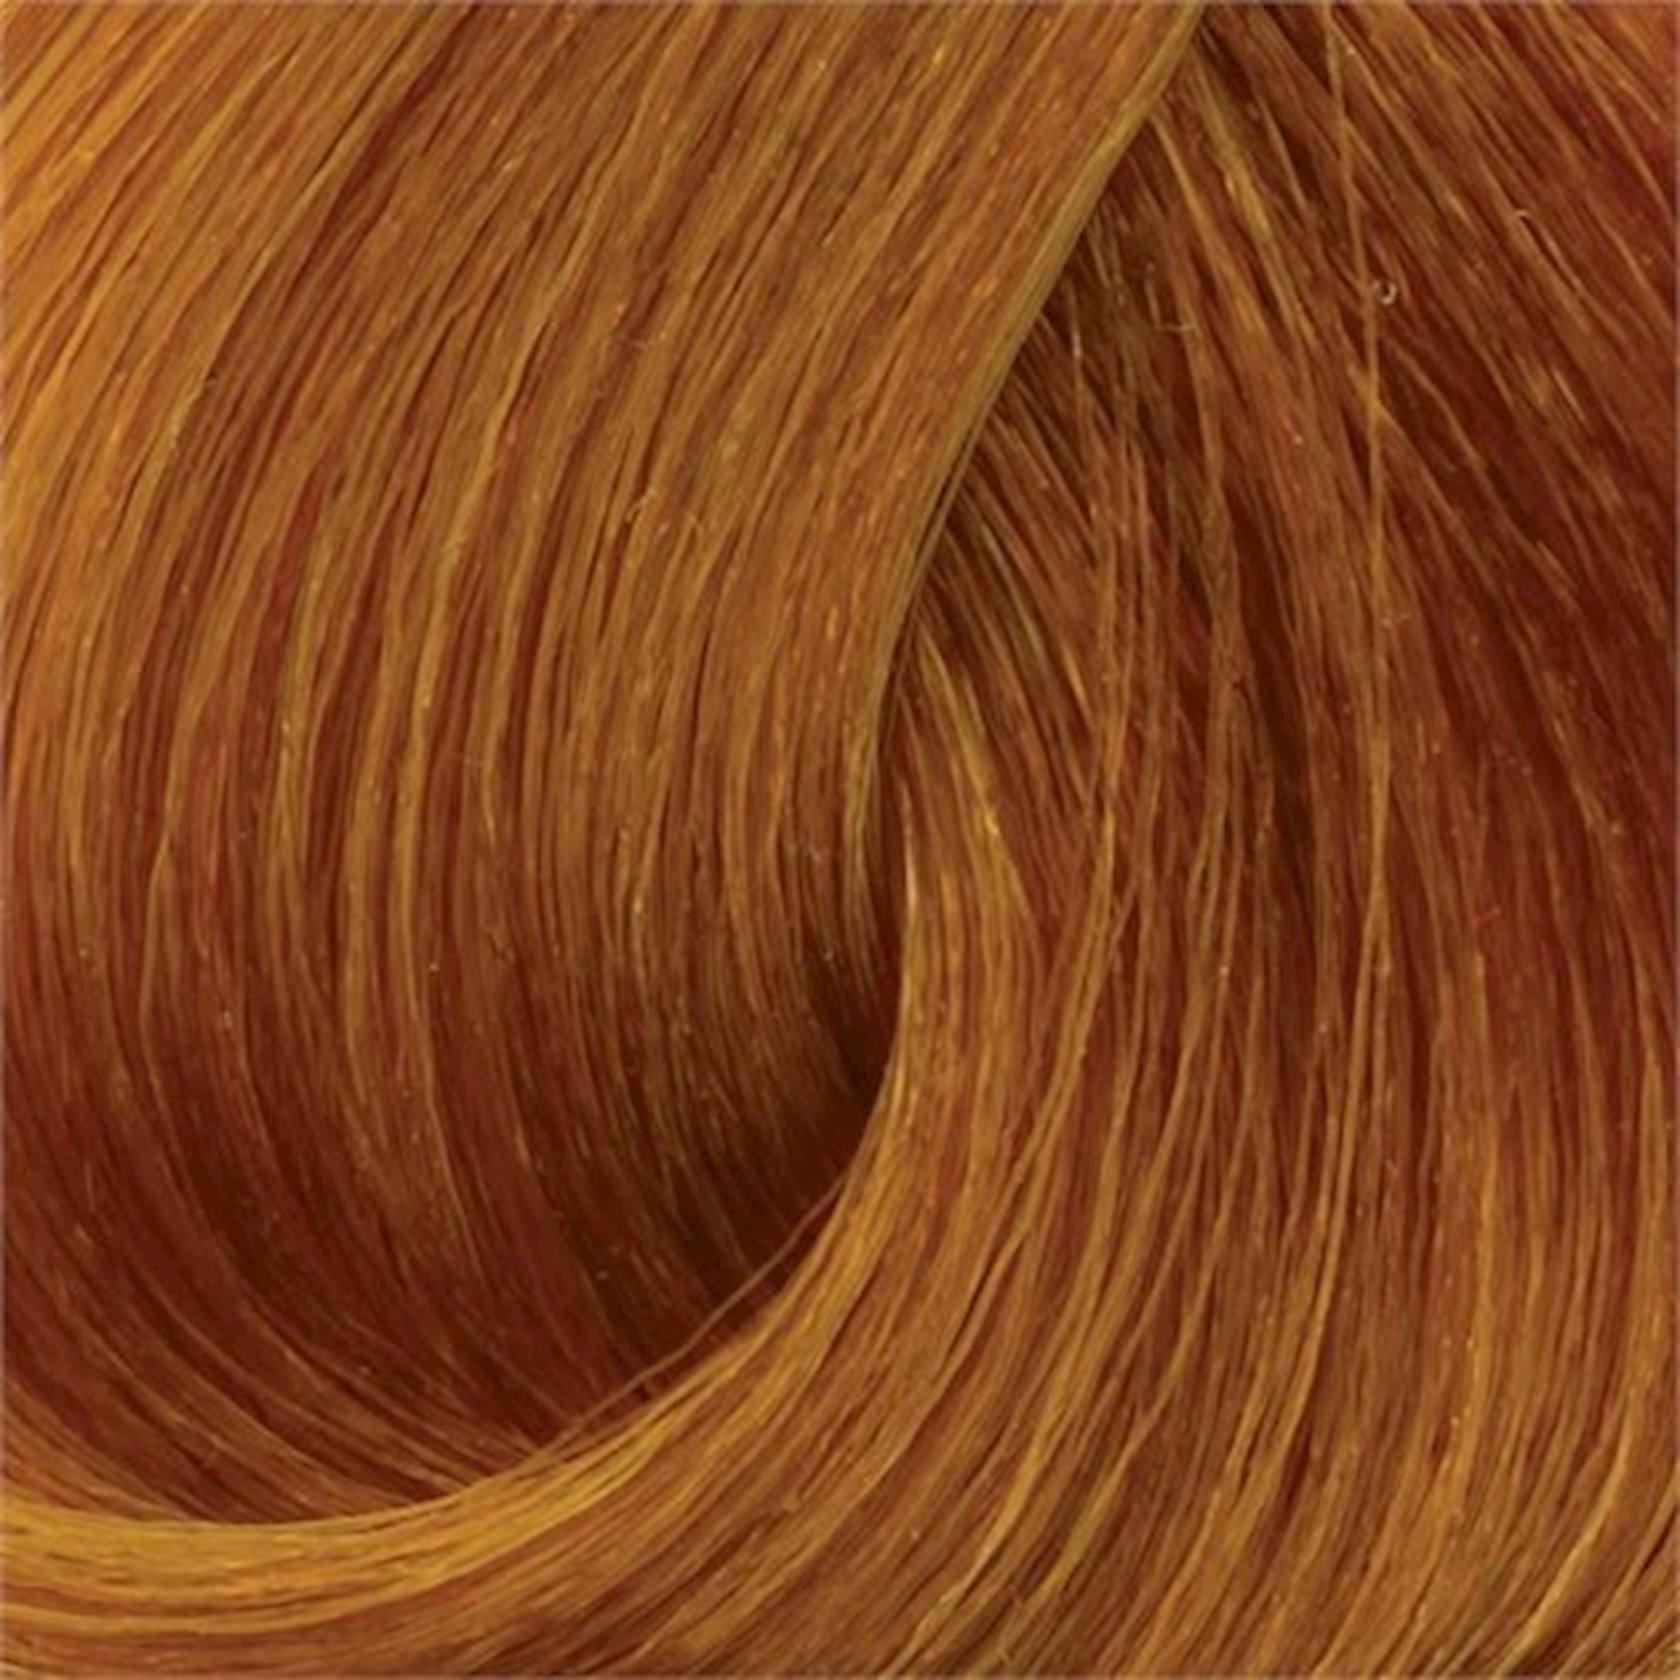 Saç üçün qalıcı krem boya Exicolor Permanent Hair Color Cream 100 ml №9.37 Açık Bal Sarısı, Açıq bal sarışın